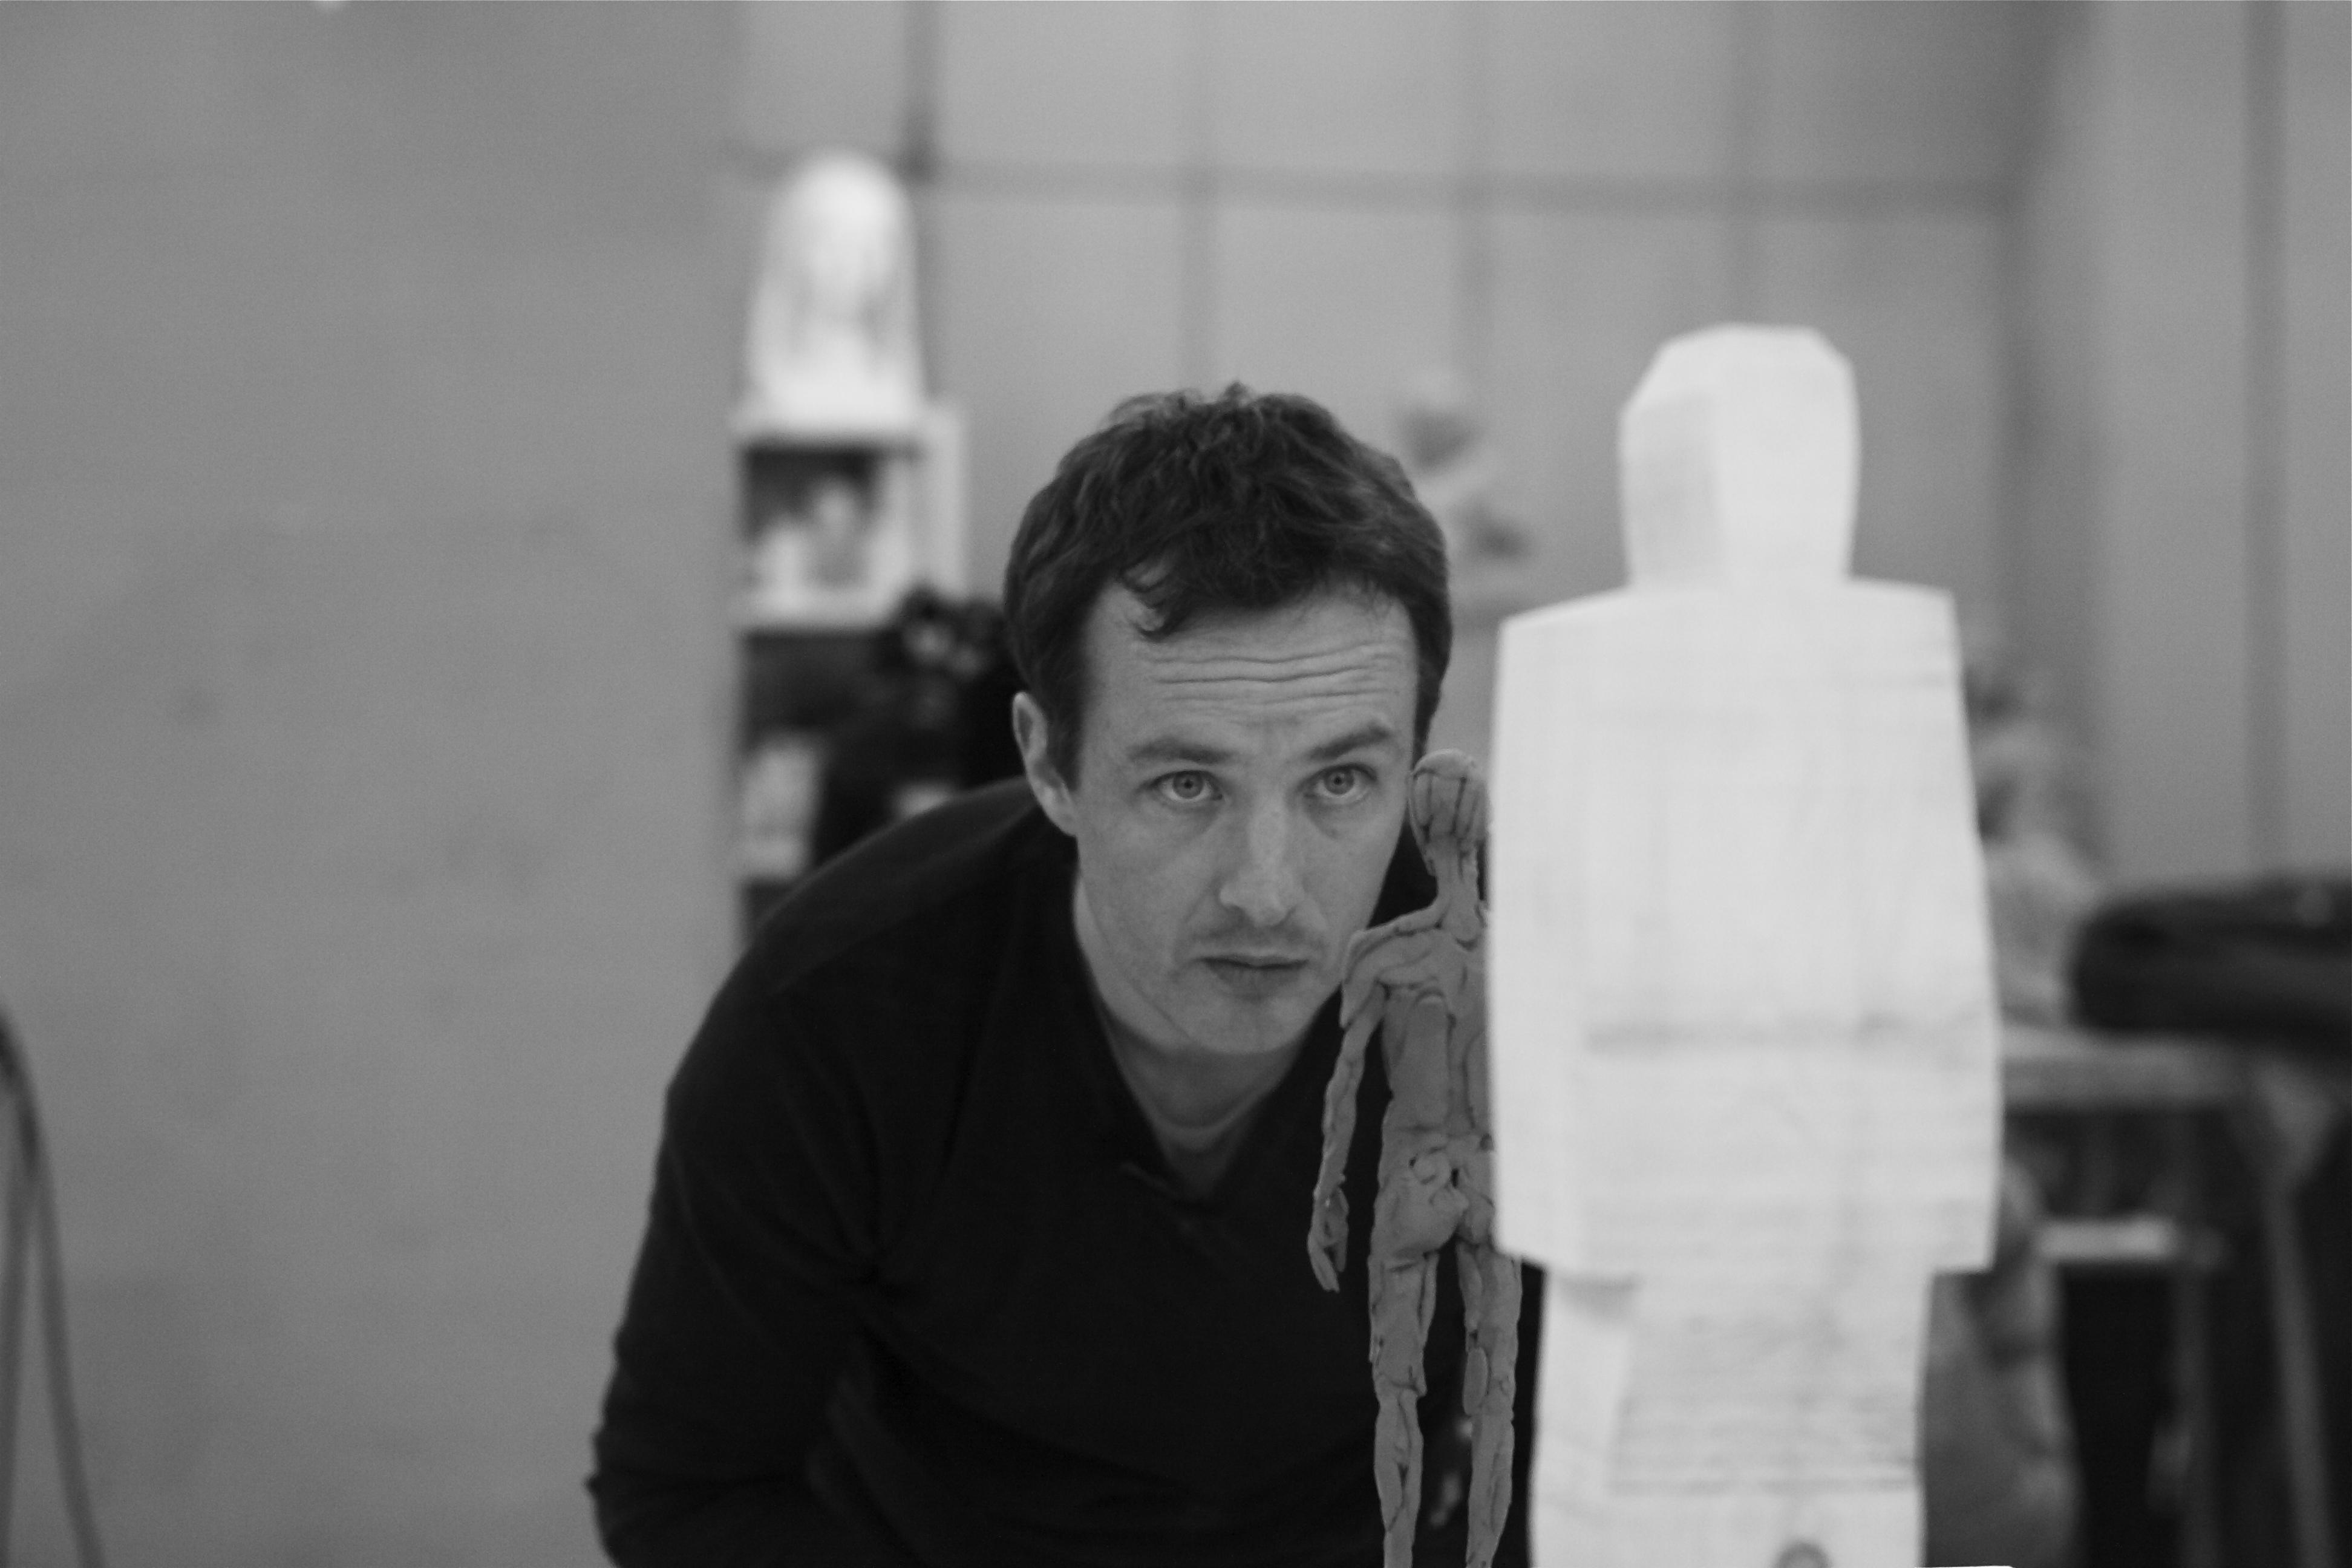 Flickr - Aron Demetz - Dialoghi e materia - Workshop a cura di Franco Reina42